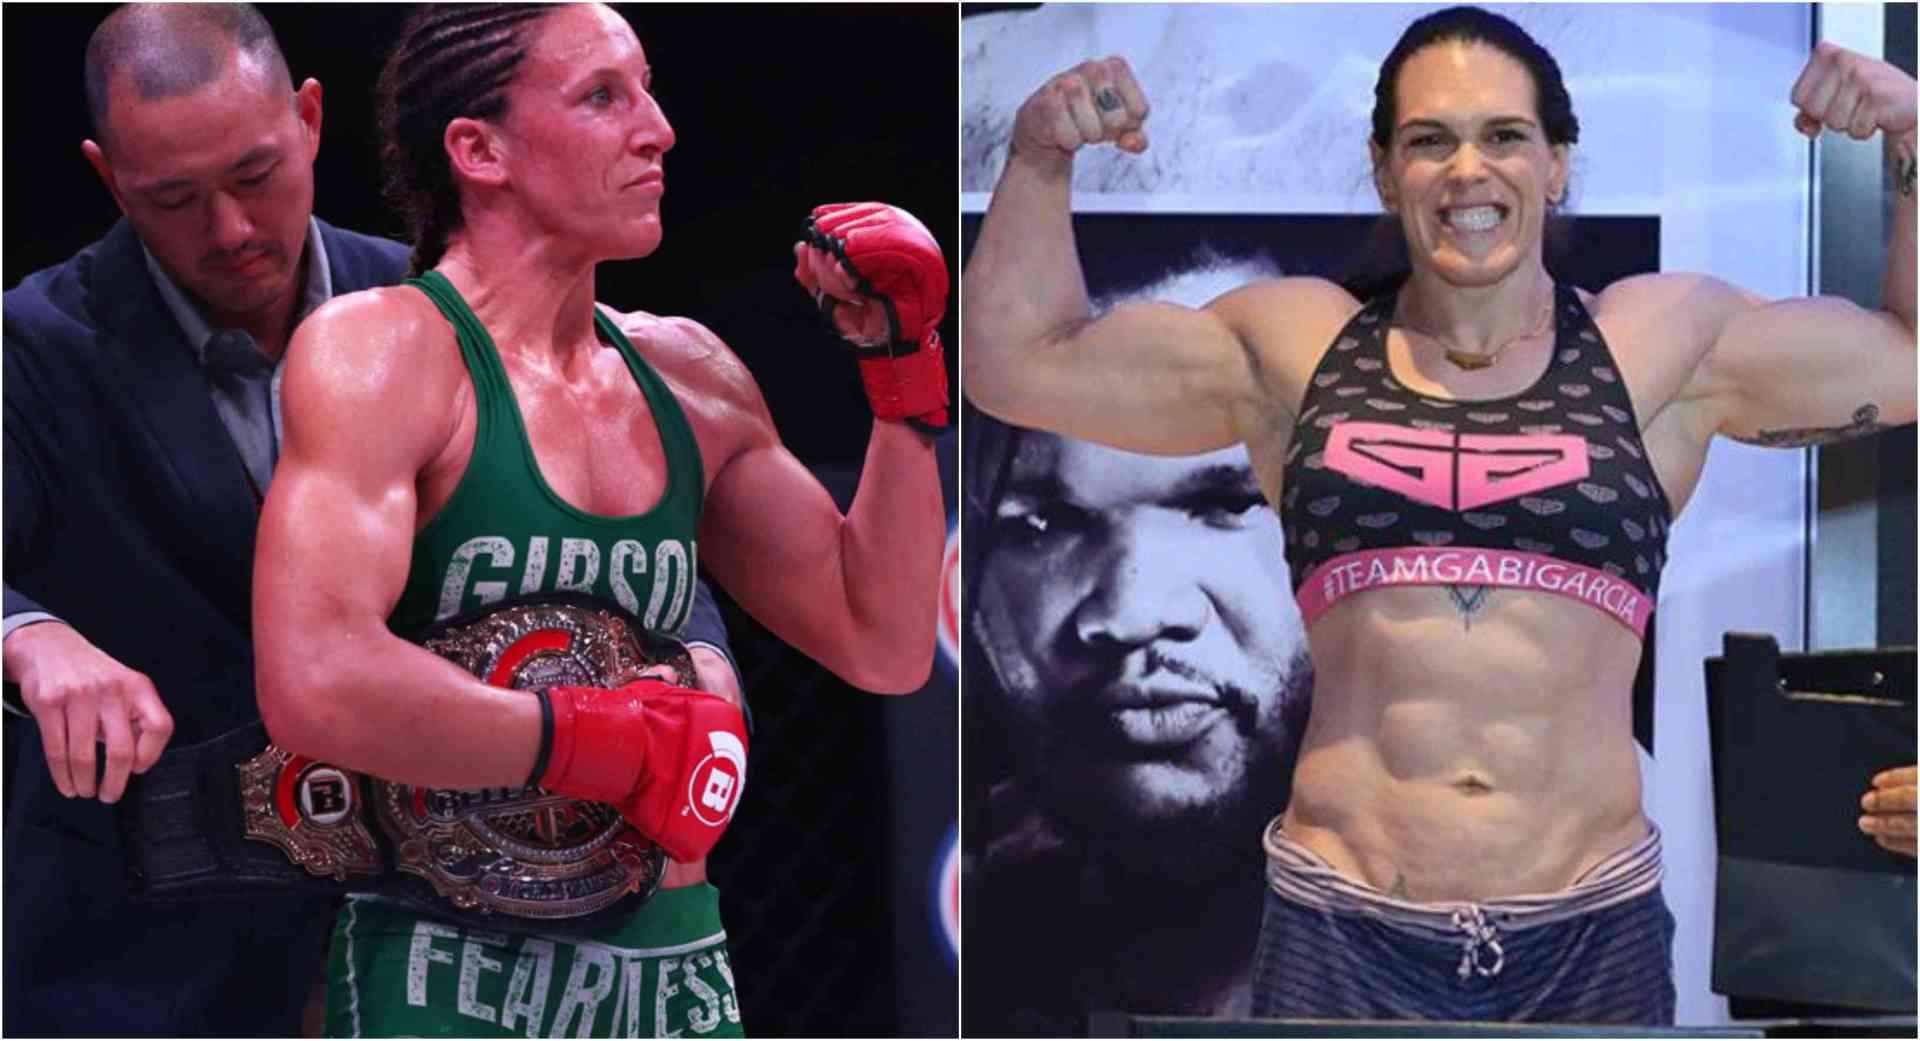 Bellator champ Julia Budd wants to fight Rizin's Gabi Garcia - Julia